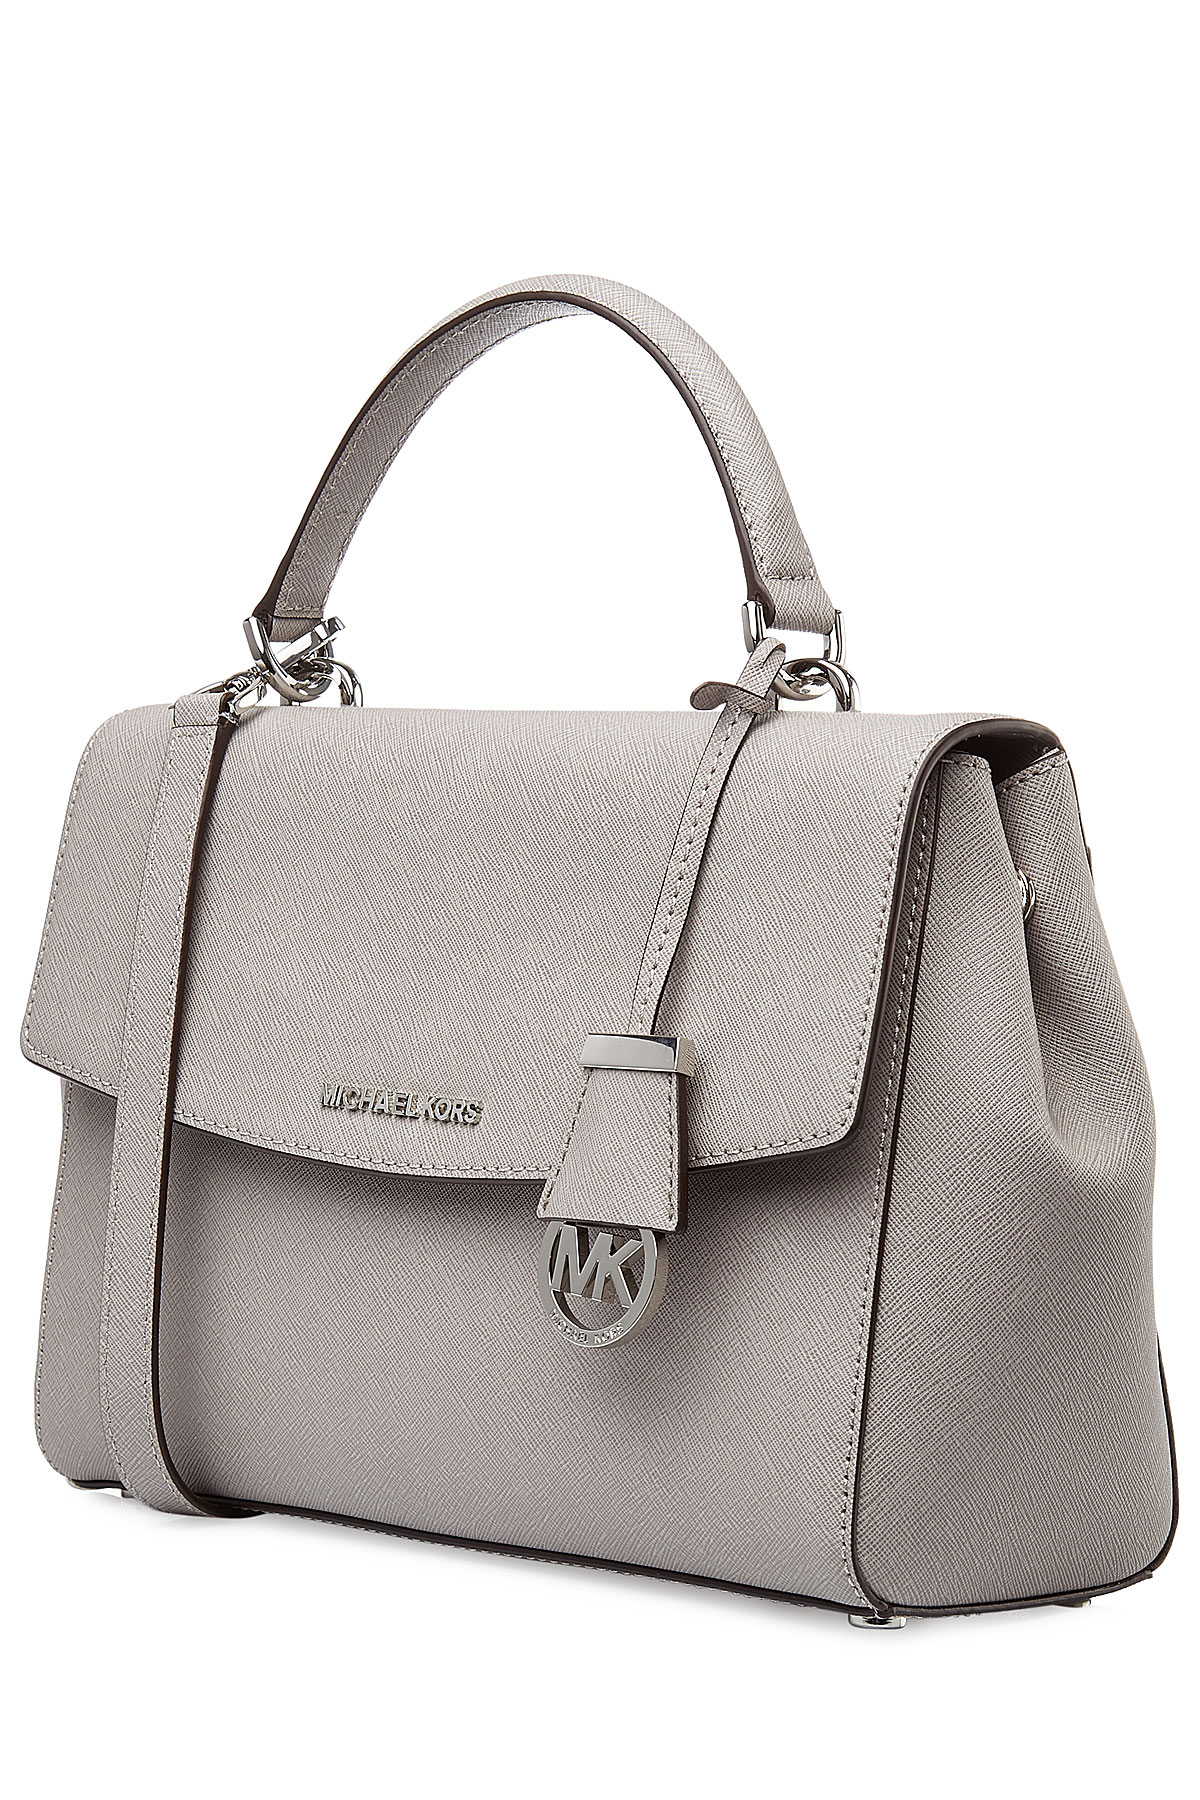 4b71b451f48e Lyst - MICHAEL Michael Kors Ava Small Leather Tote - Grey in Gray